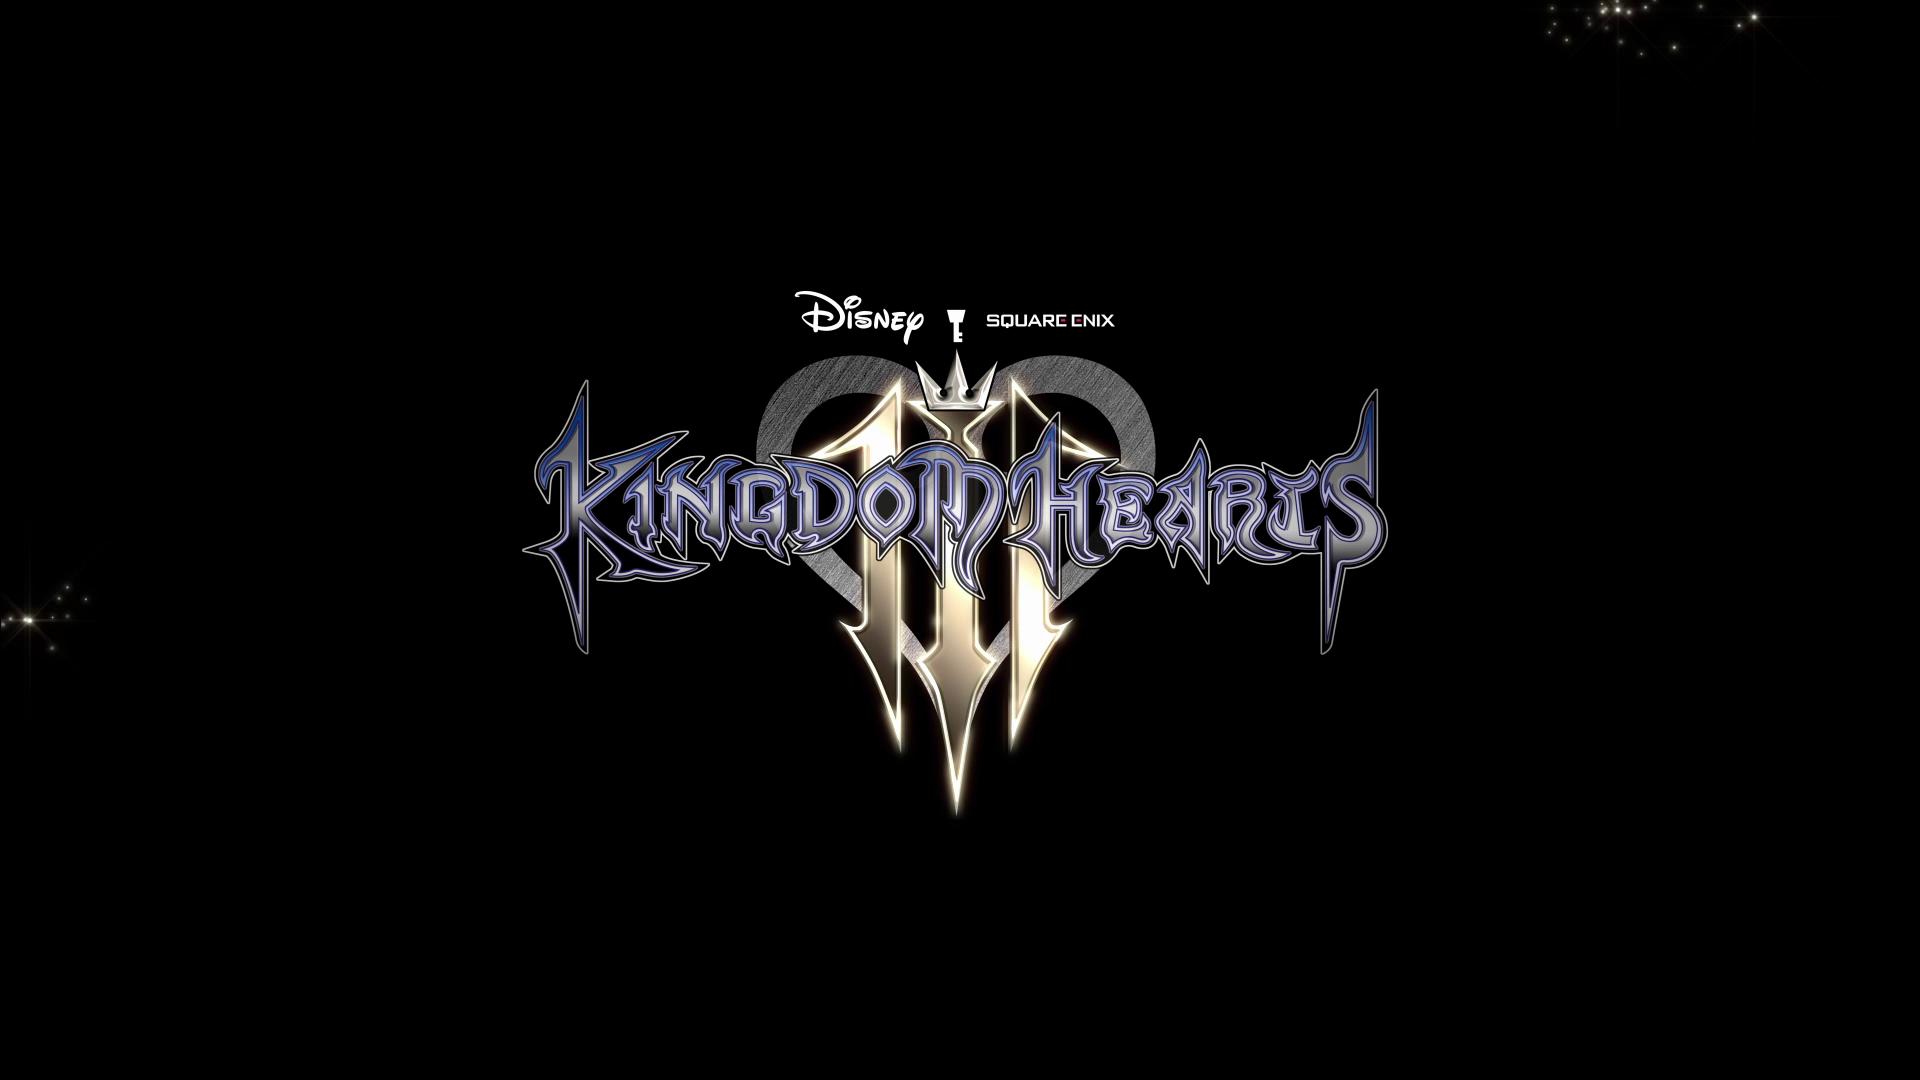 10662016 1025593687458262 6680452645922551340 O Png 1920 1080 Kingdom Hearts Funny Kingdom Hearts Kingdom Hearts 3